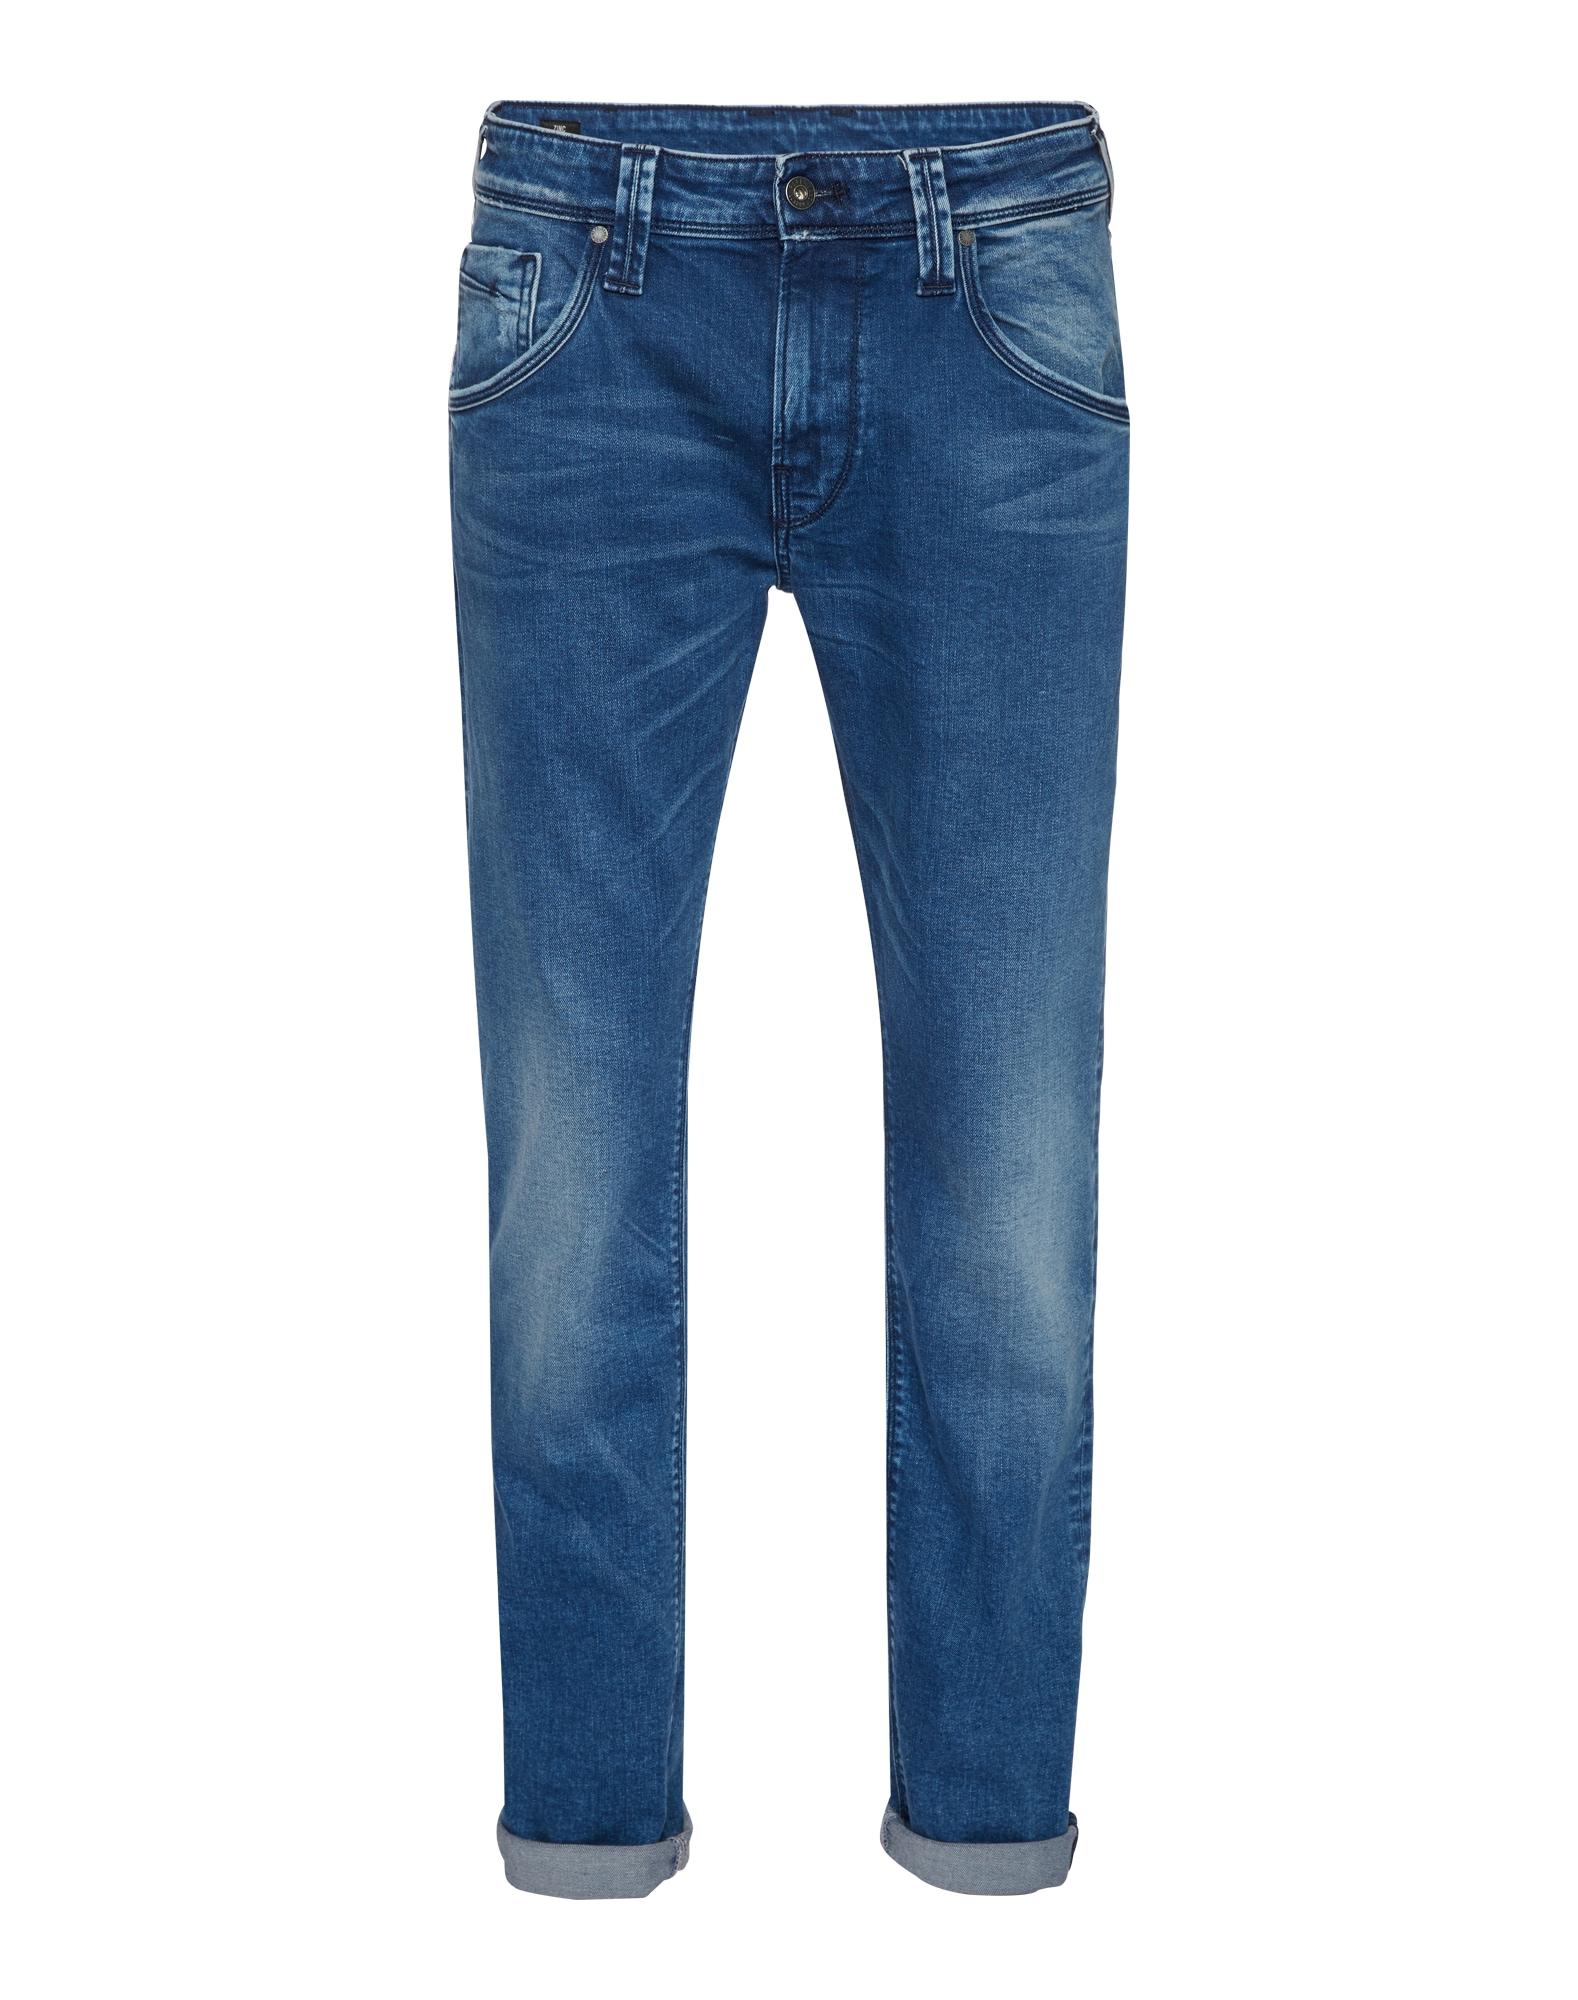 Pepe Jeans Heren Jeans Zinc blue denim